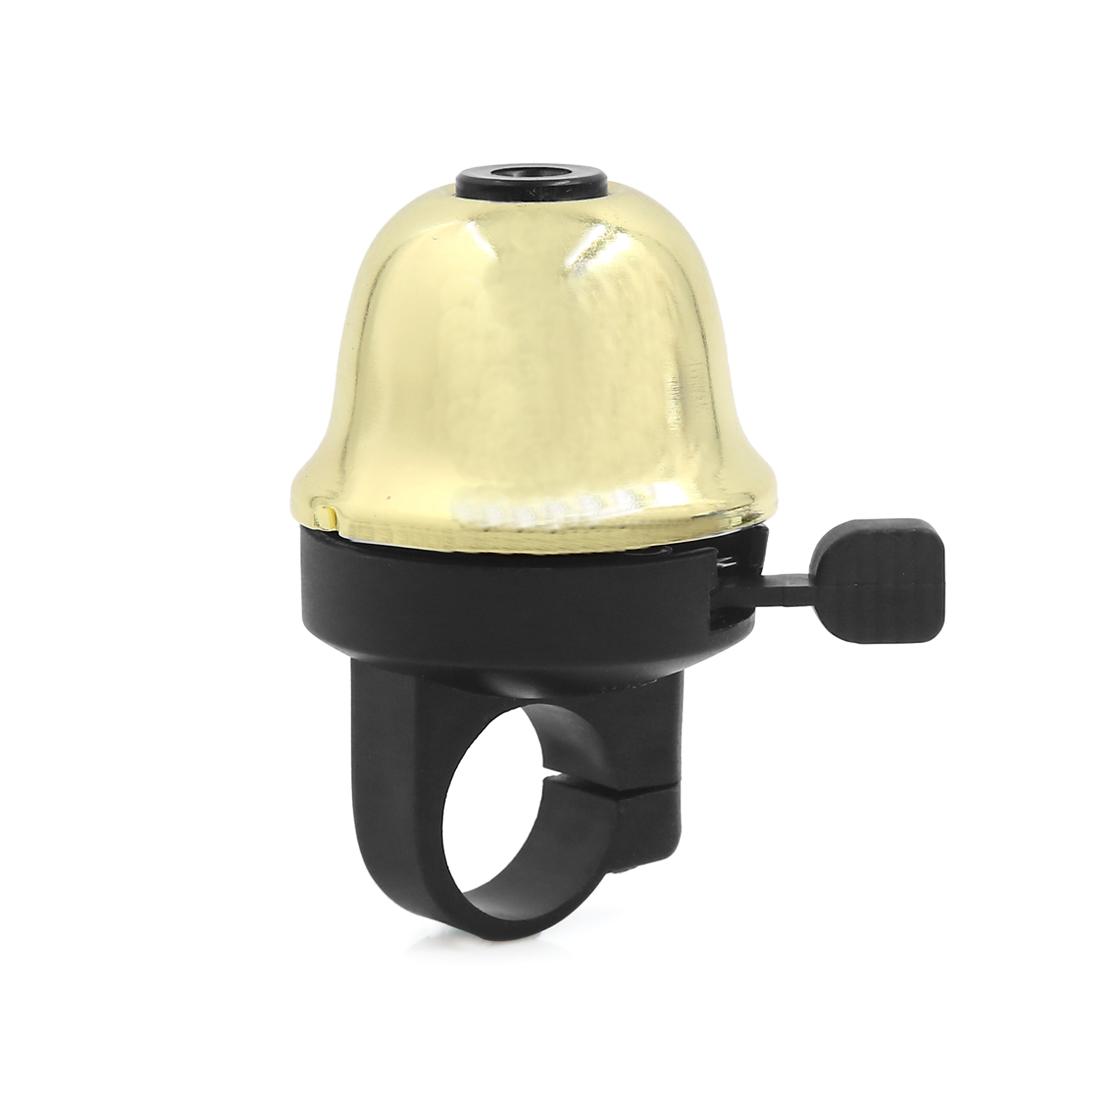 Gold Tone 22mm Handlebar Diameter MTB Bike Bicycle Safety Alarm Ring Bell